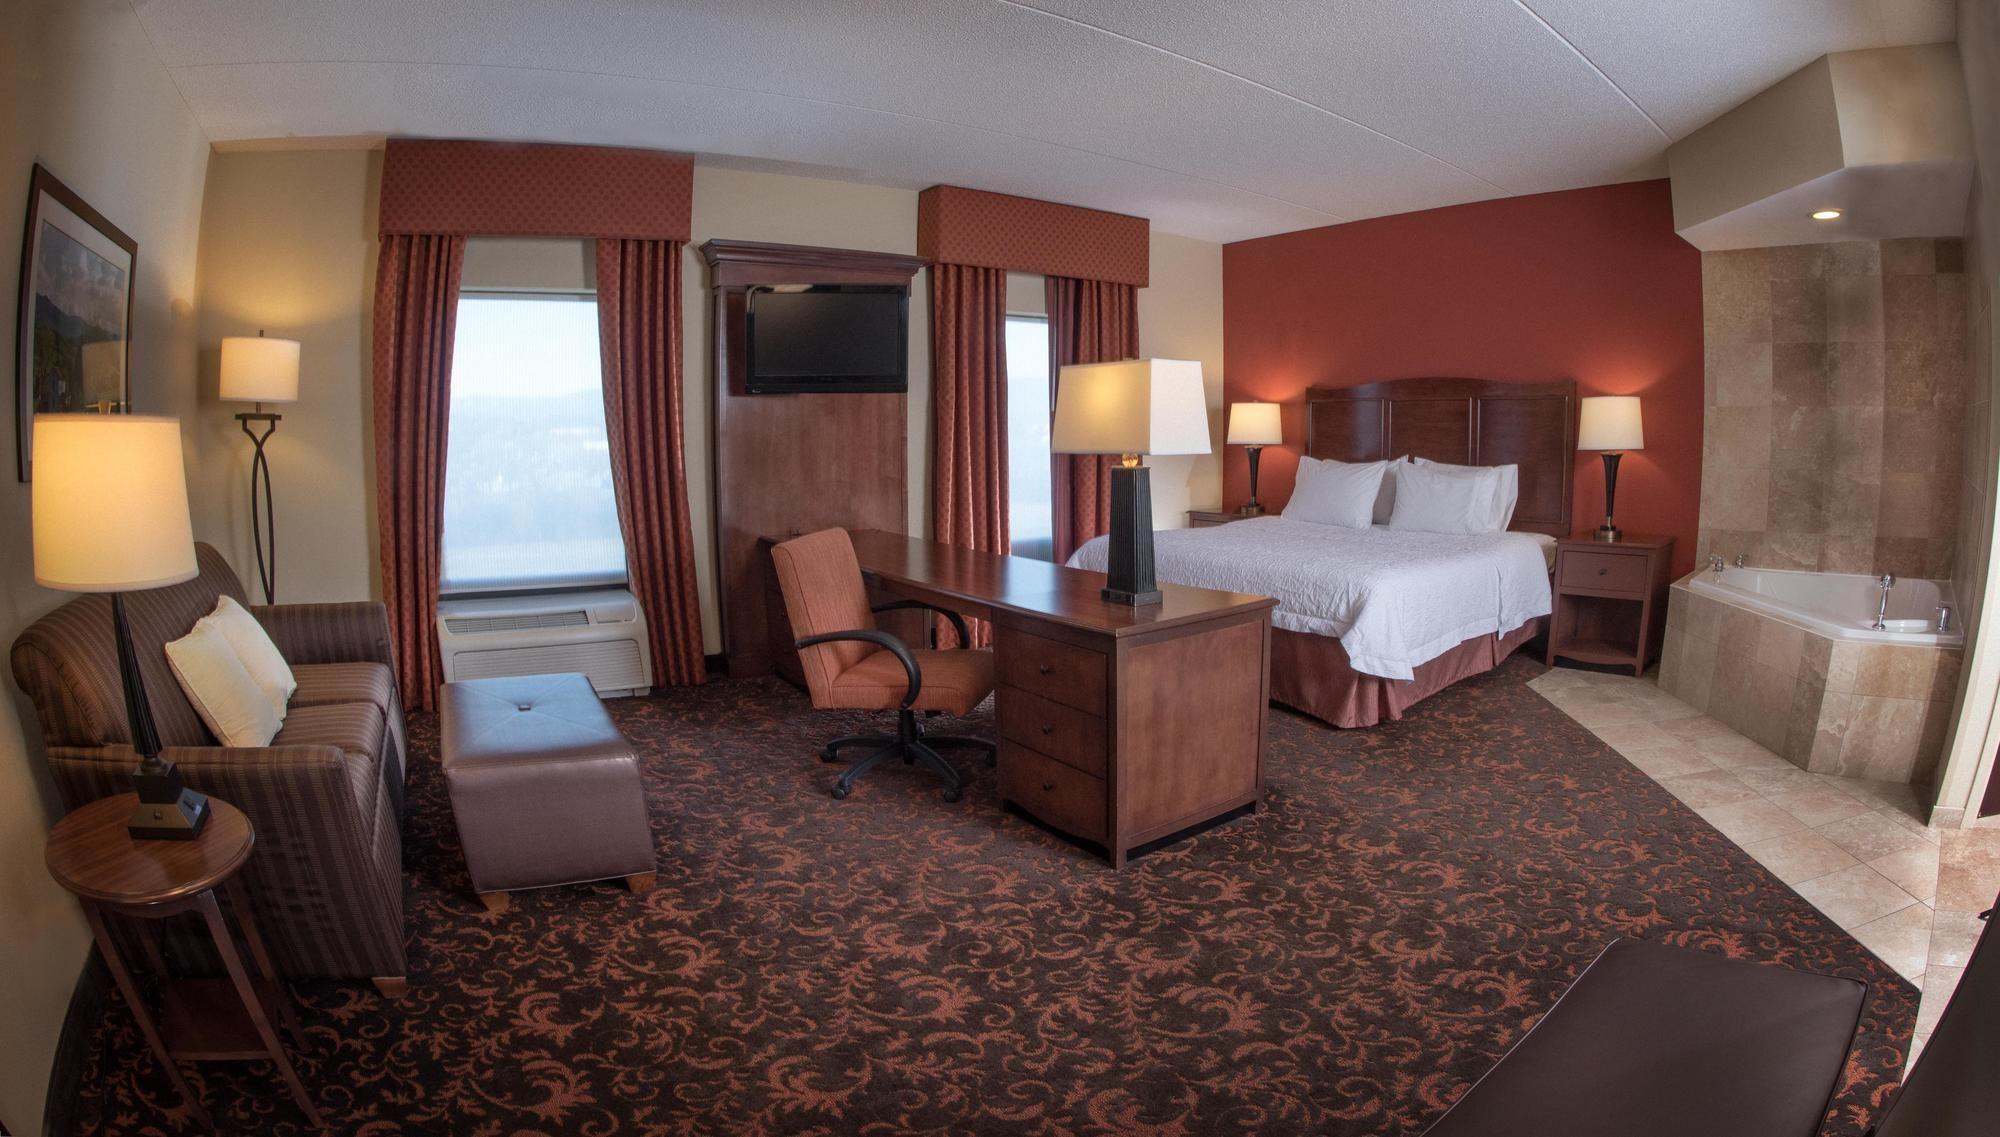 Hampton Inn & Suites in Woodstock, VA